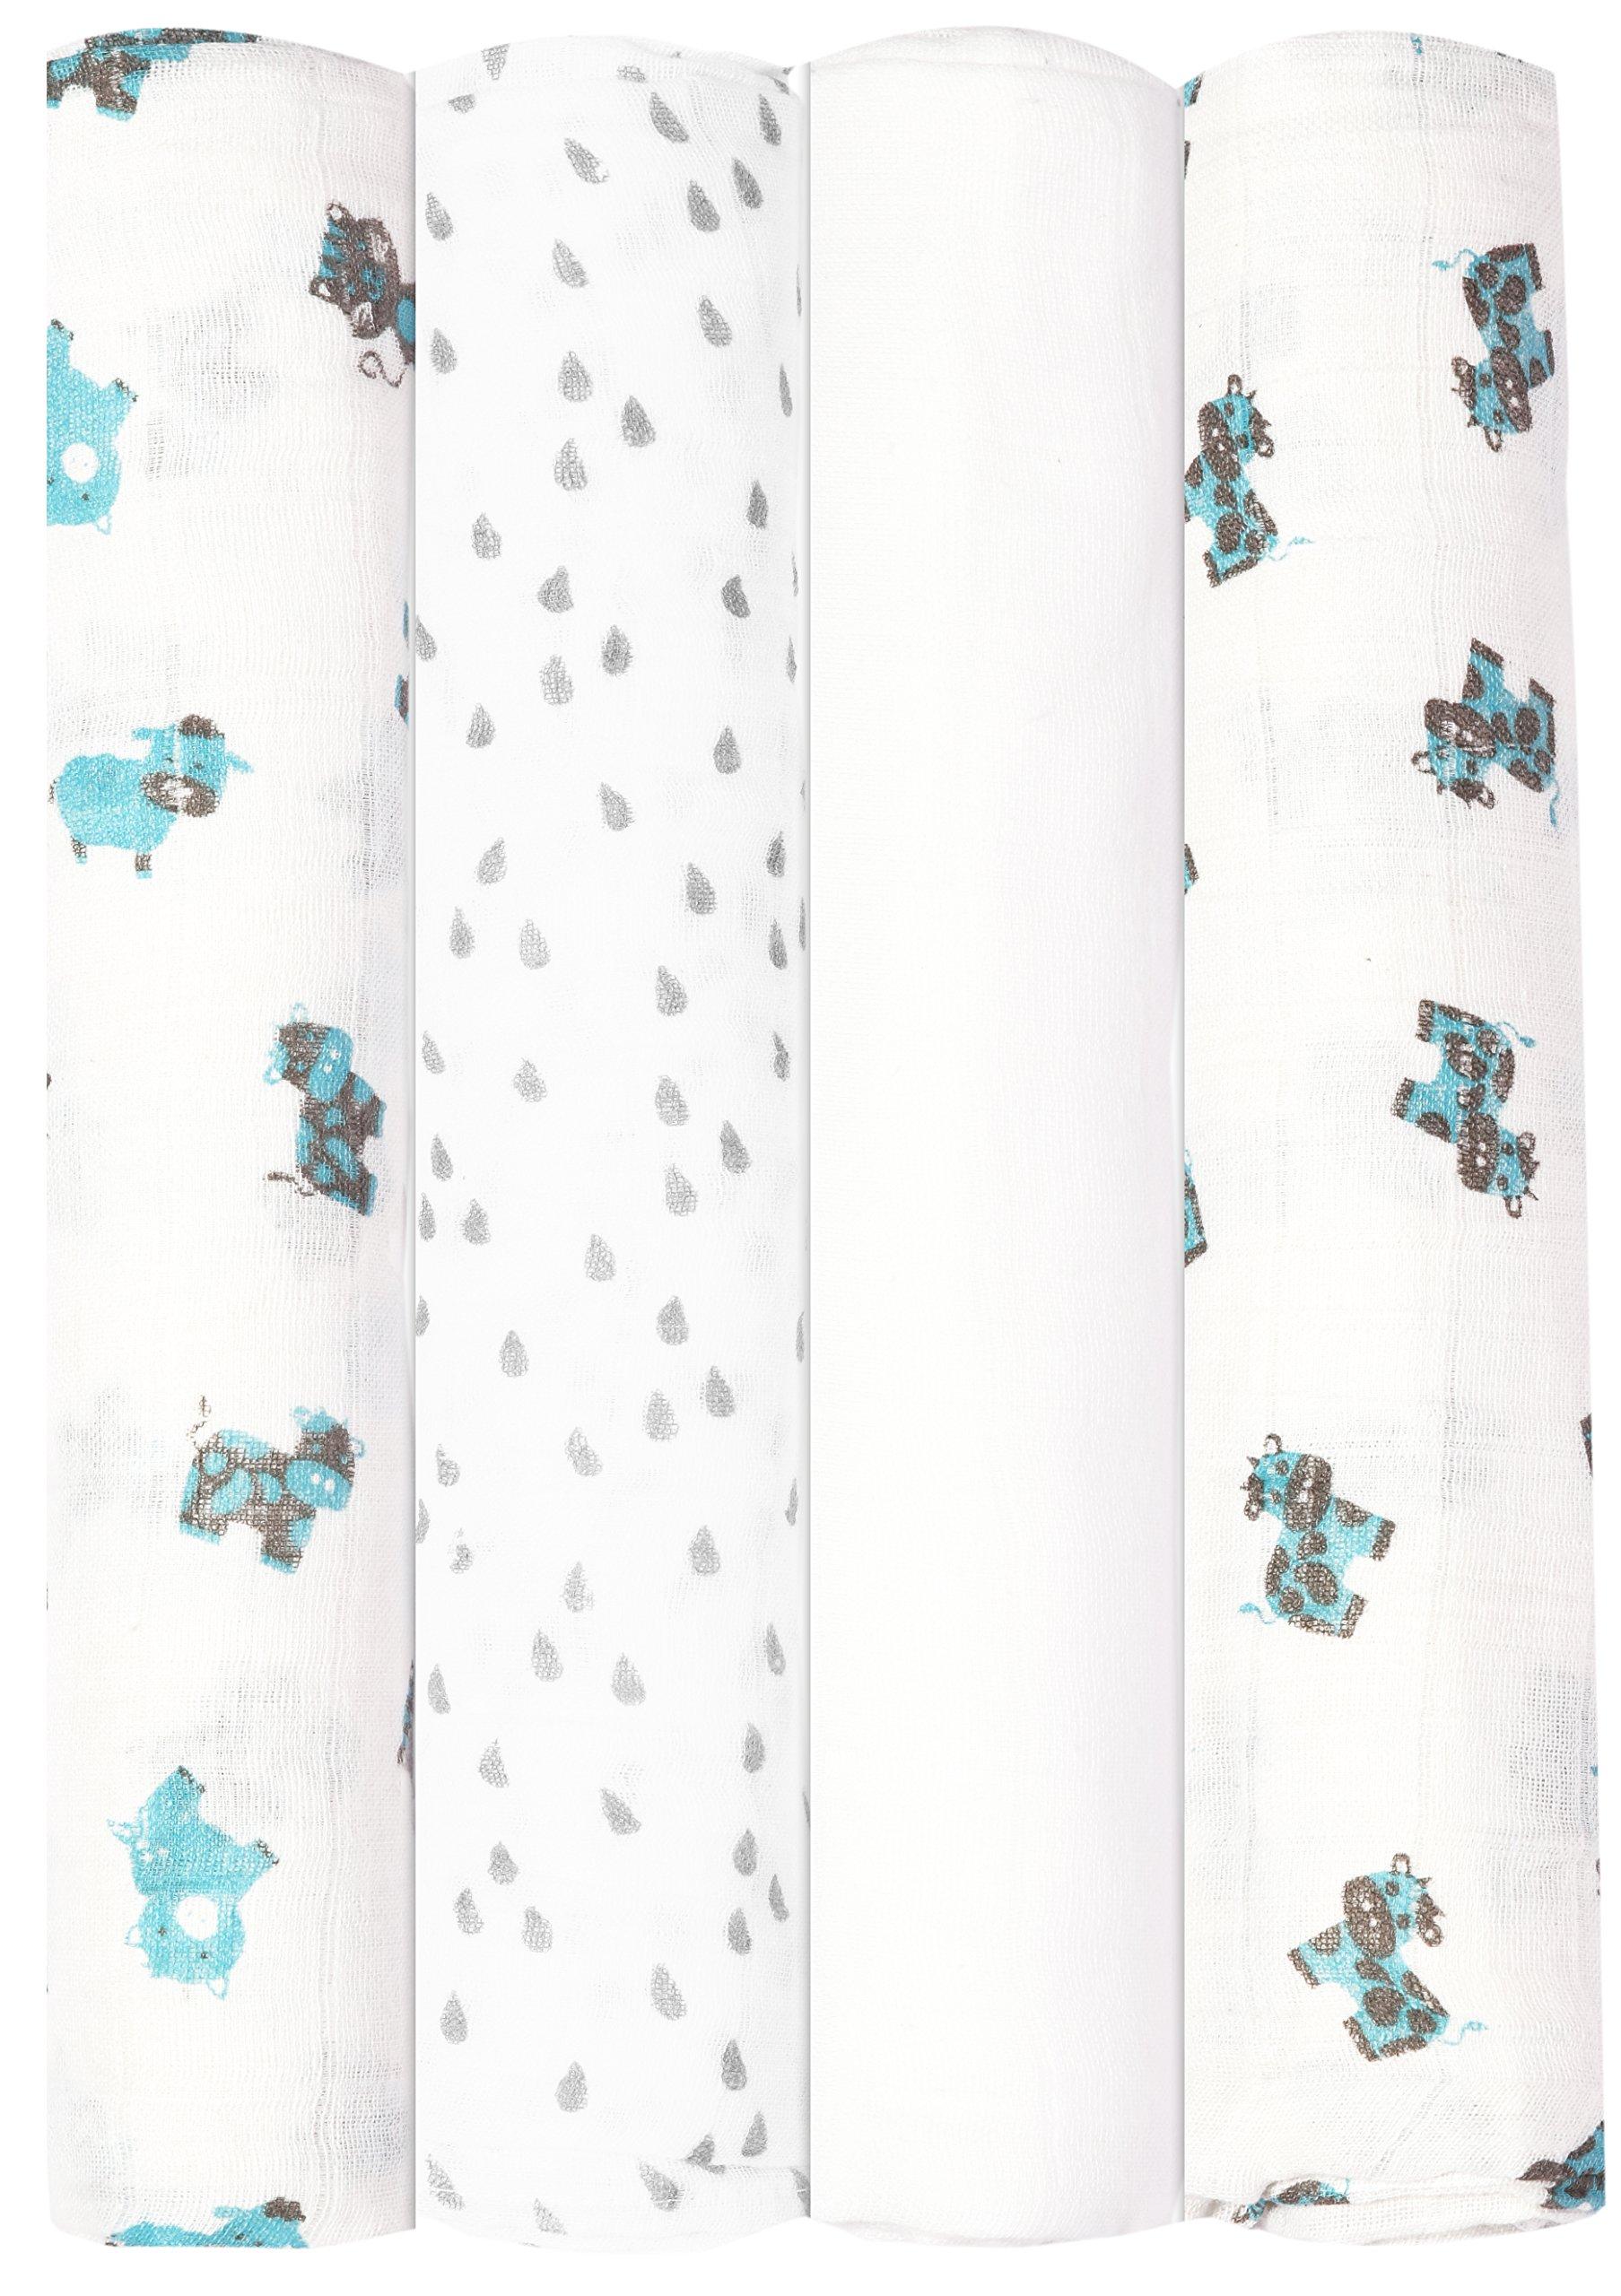 Babykin Organic Cotton Muslin Swaddle Blankets, Blue Farm Animals, 4 Piece Pack